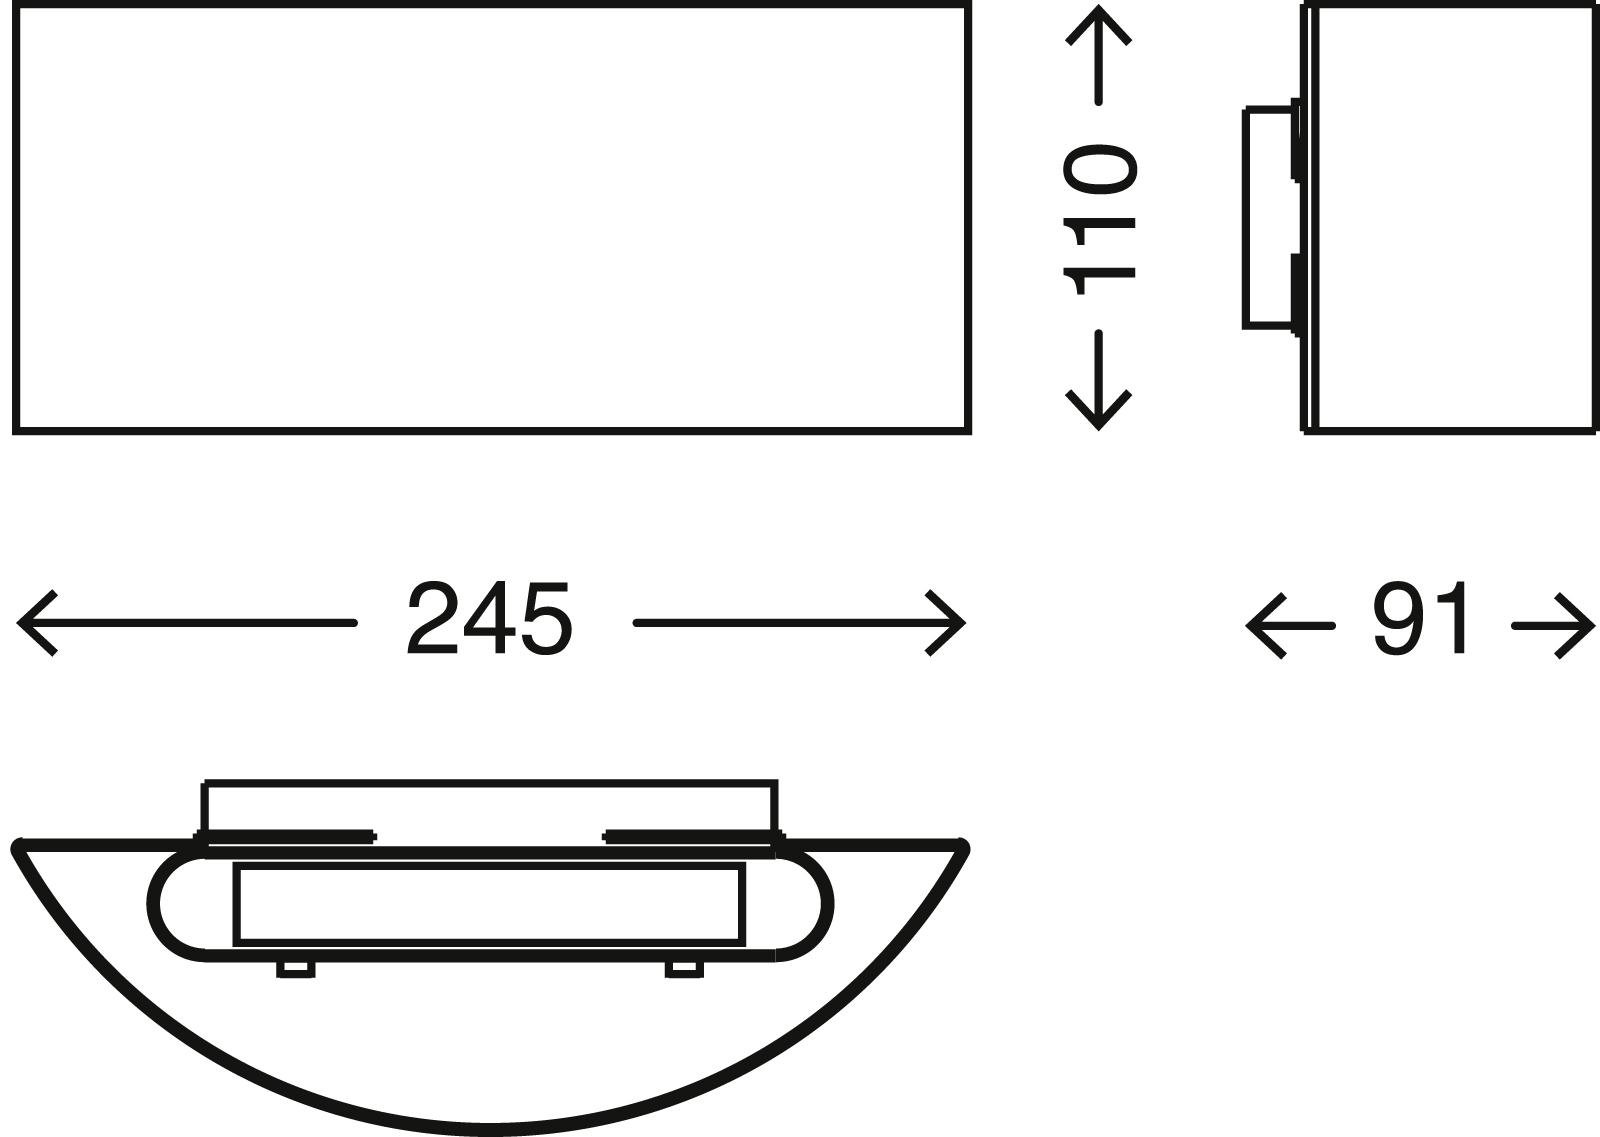 TELEFUNKEN LED Aussenwandleuchte, 24,5 cm, 8 W, Anthrazit